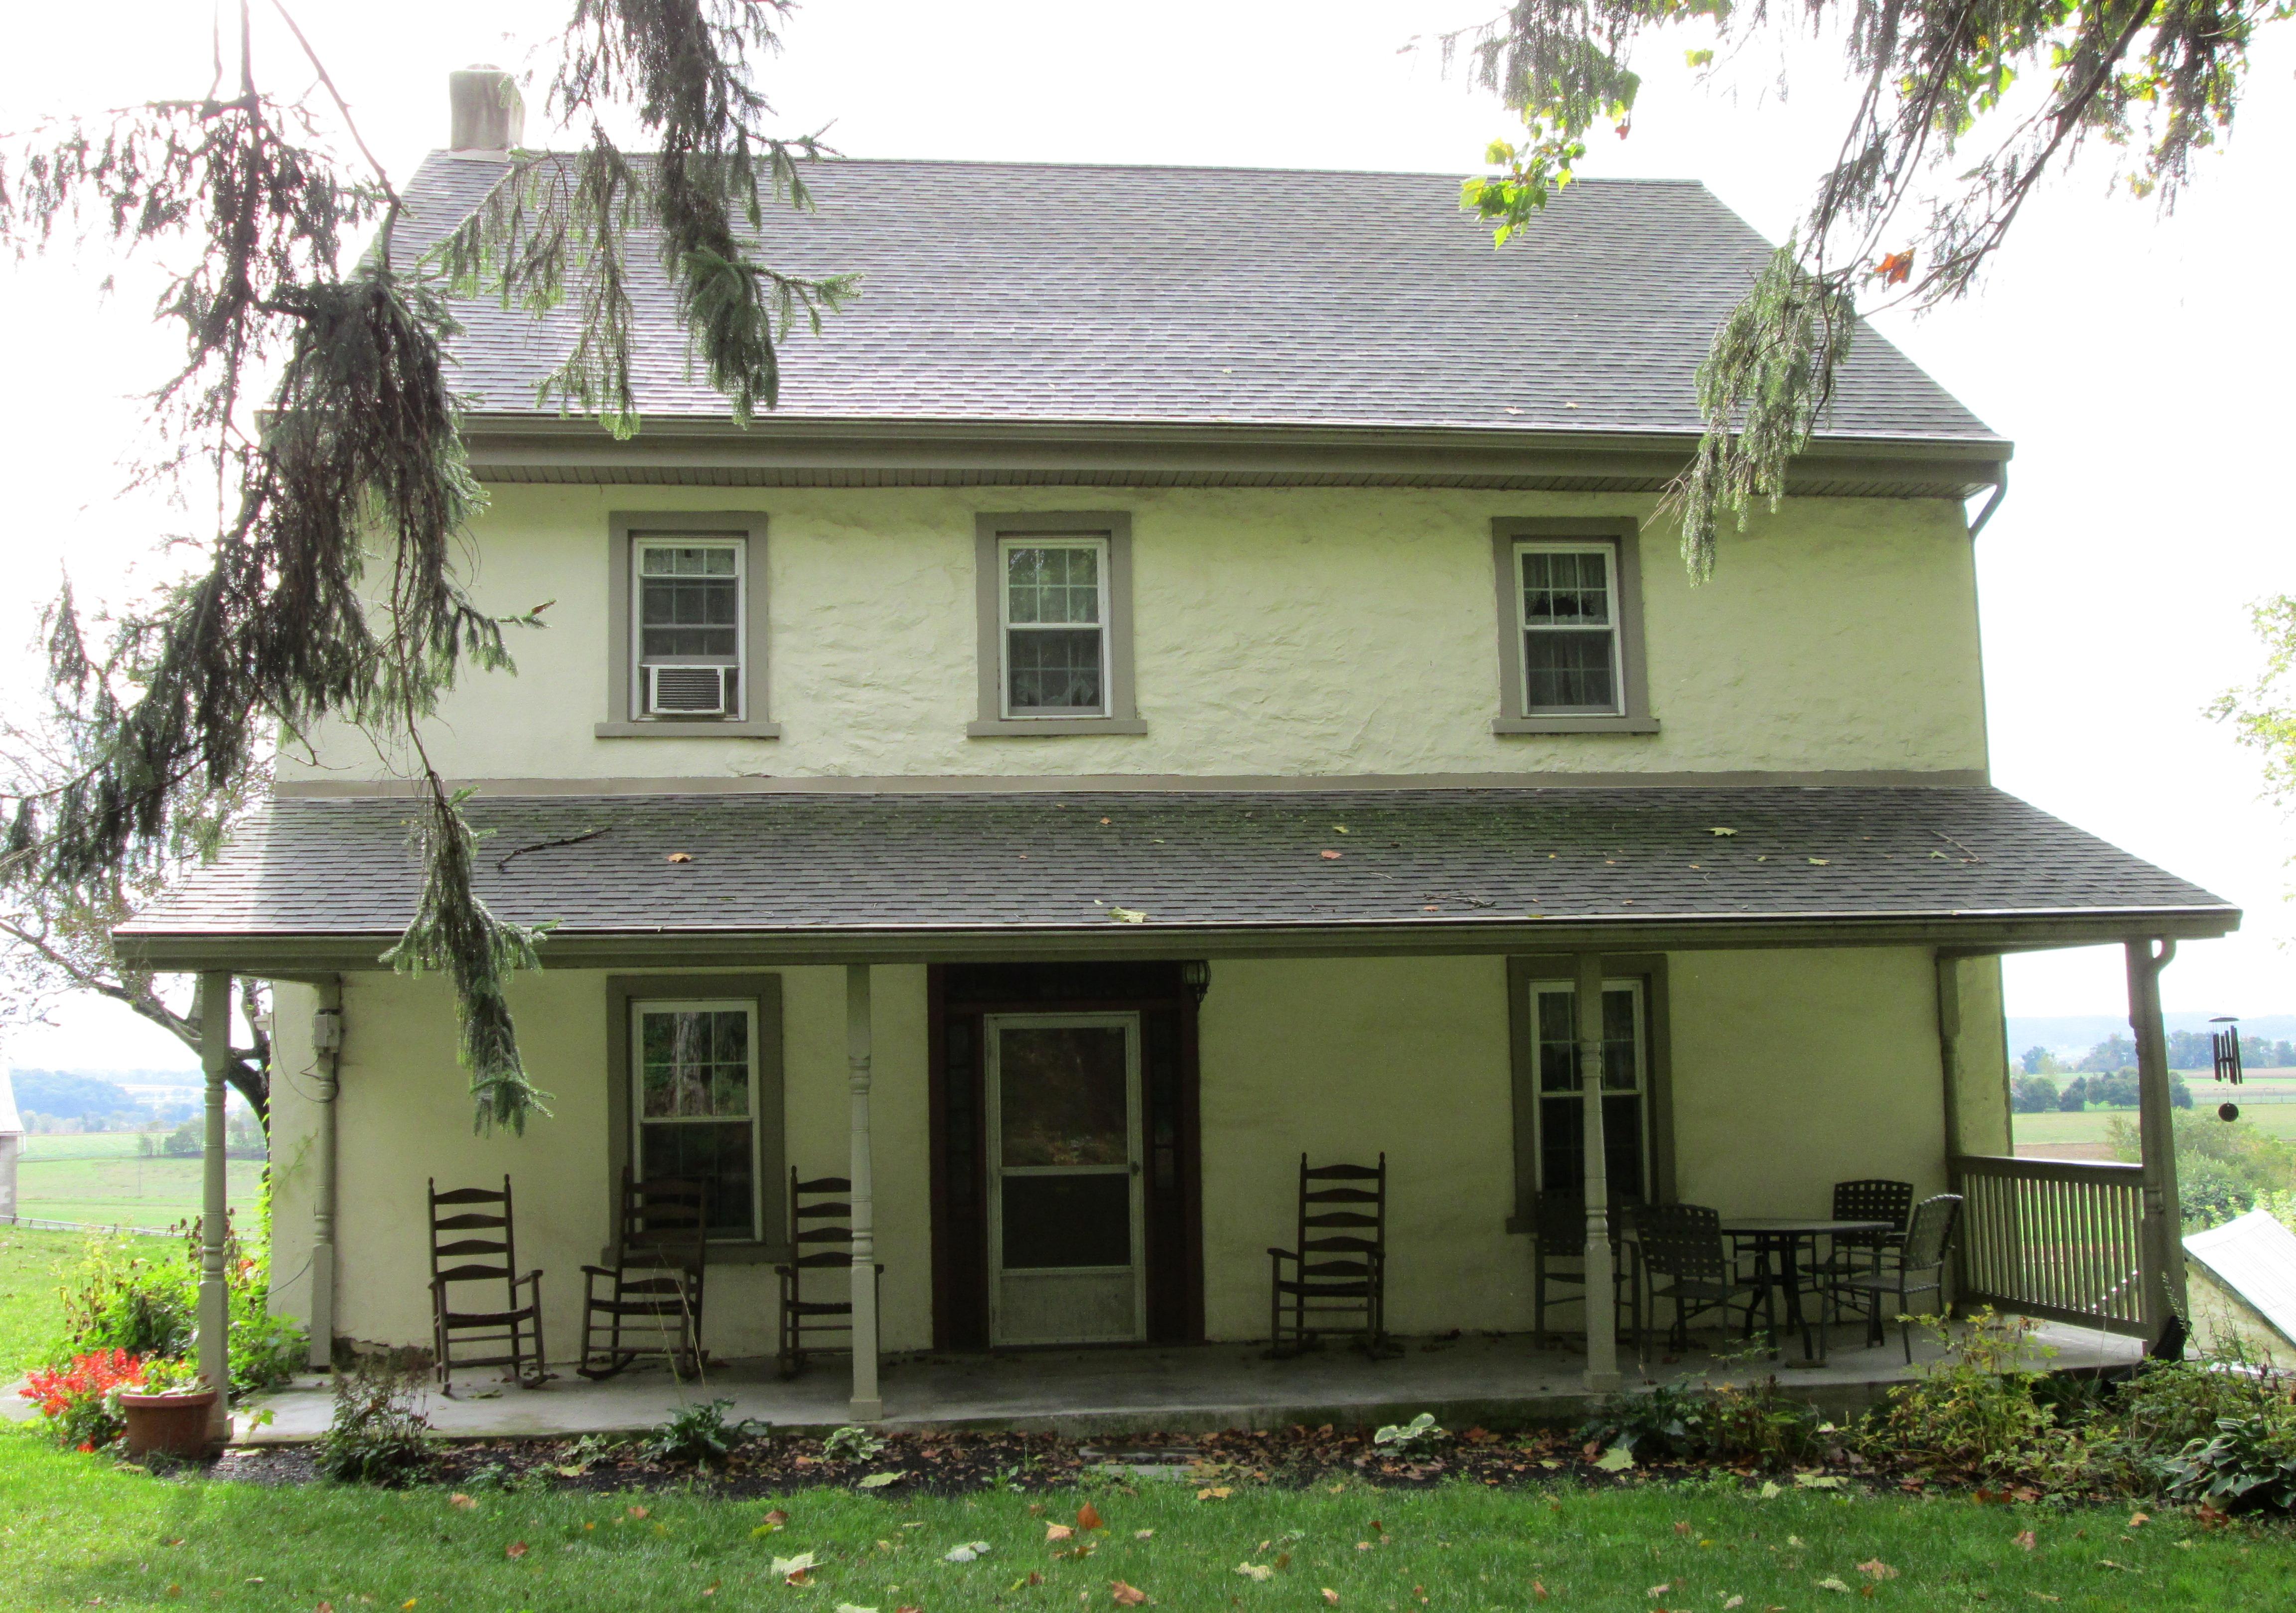 Coatesville Funeral Homes